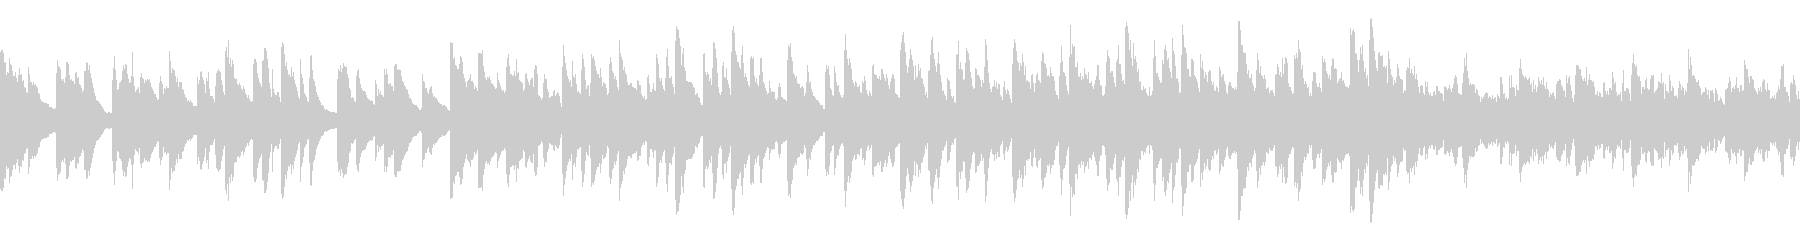 [Loop]物悲しいピアノヒーリングの未再生の波形